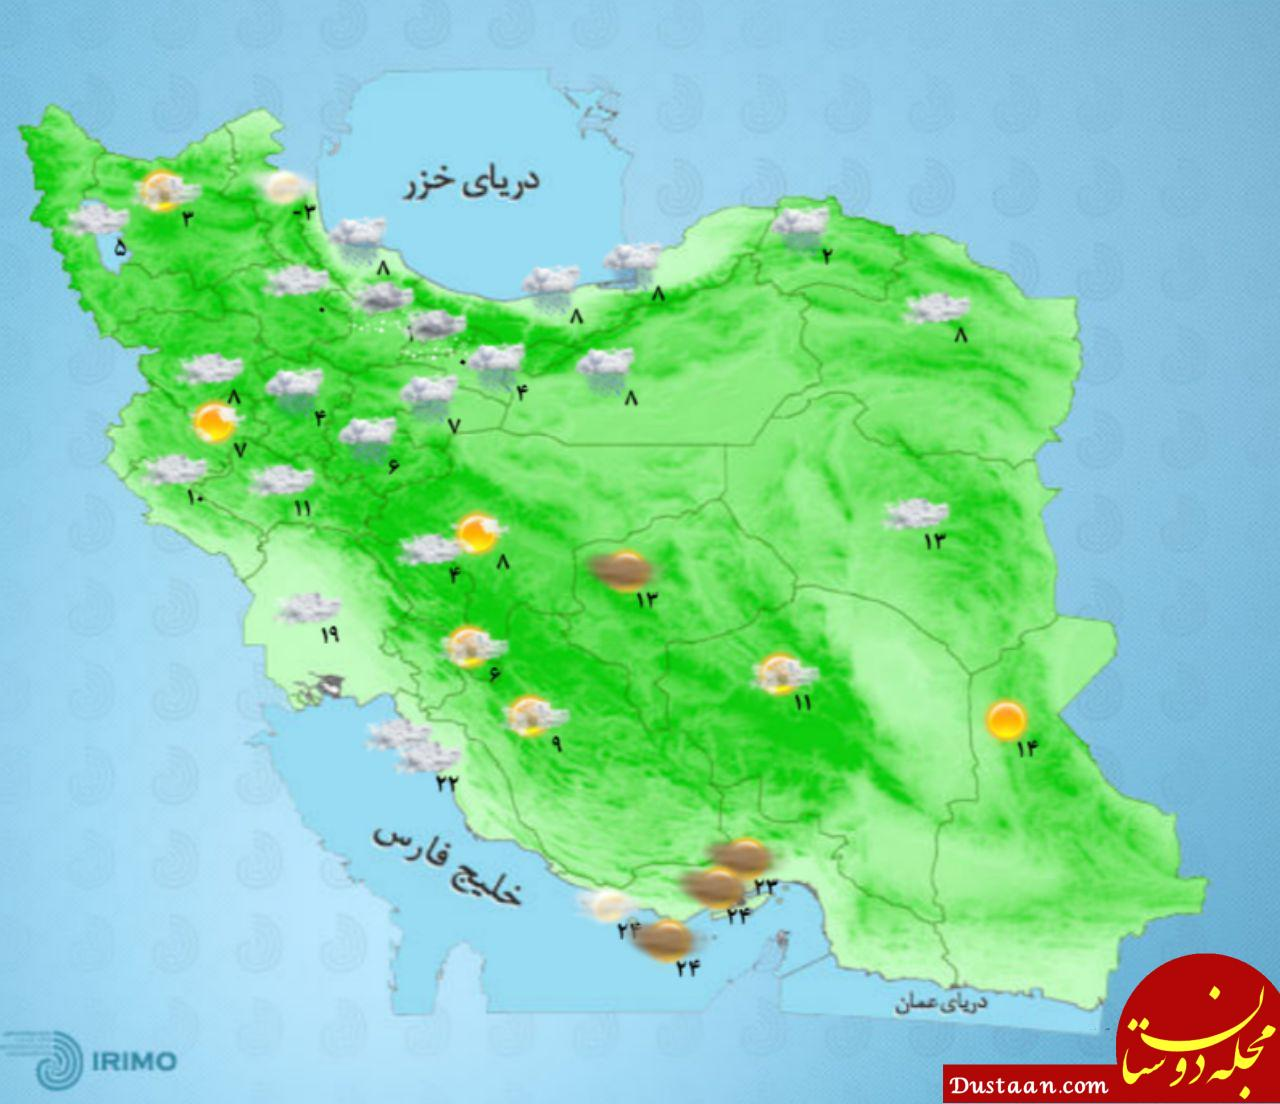 www.dustaan.com دوشنبه 27 فروردین / دمای مراکز استان های کشور +نقشه